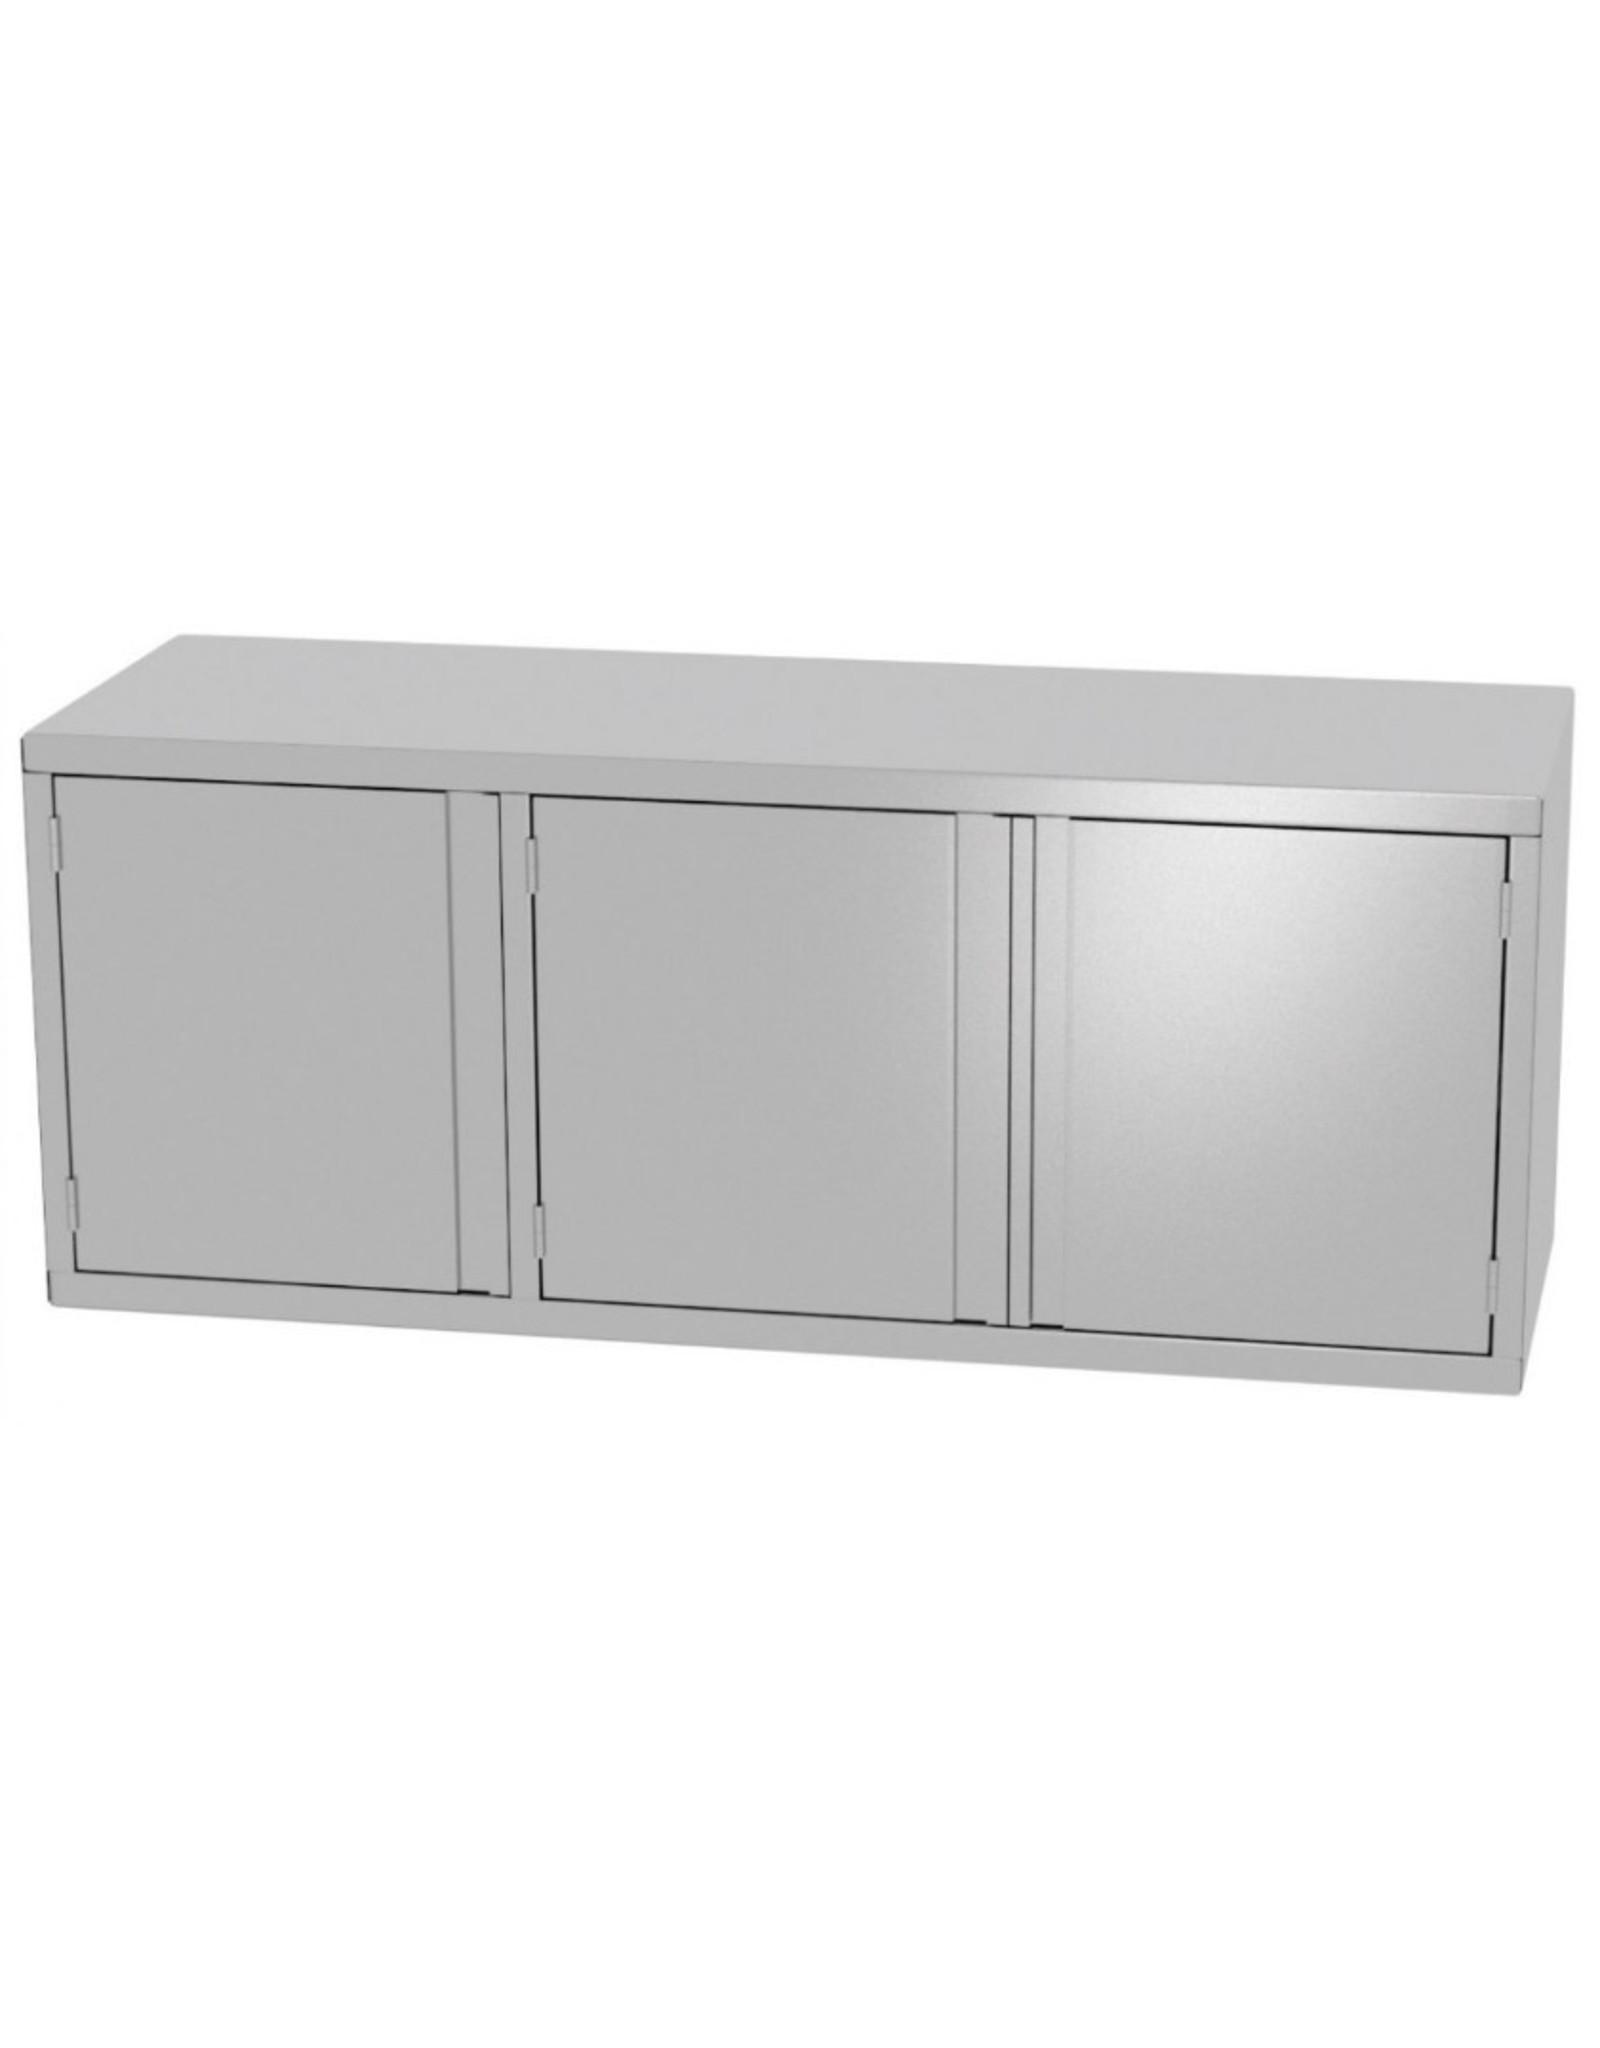 Wandkast | met 3 klapdeuren | 1400-1600mm breed | 300 of 400mm diep | 600mm hoog